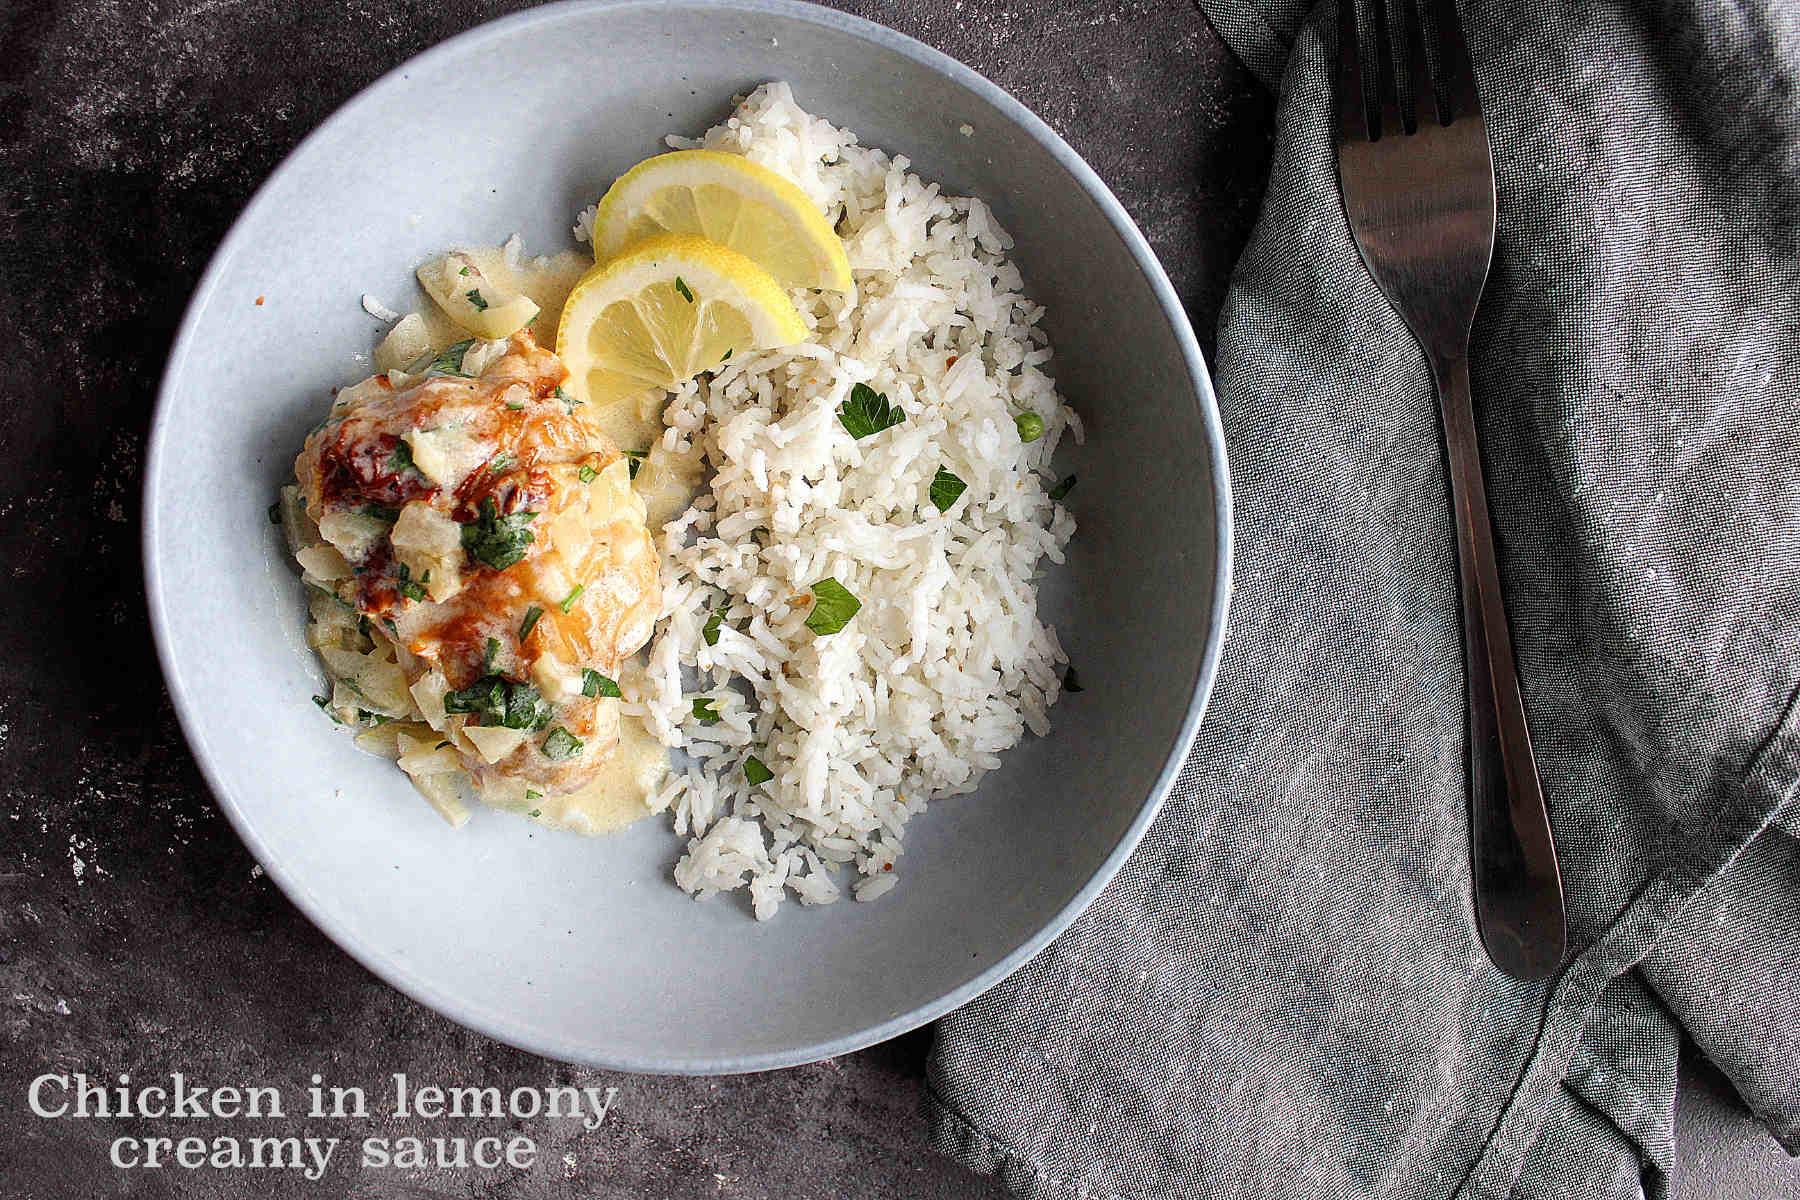 Chicken in lemony + creamy sauce